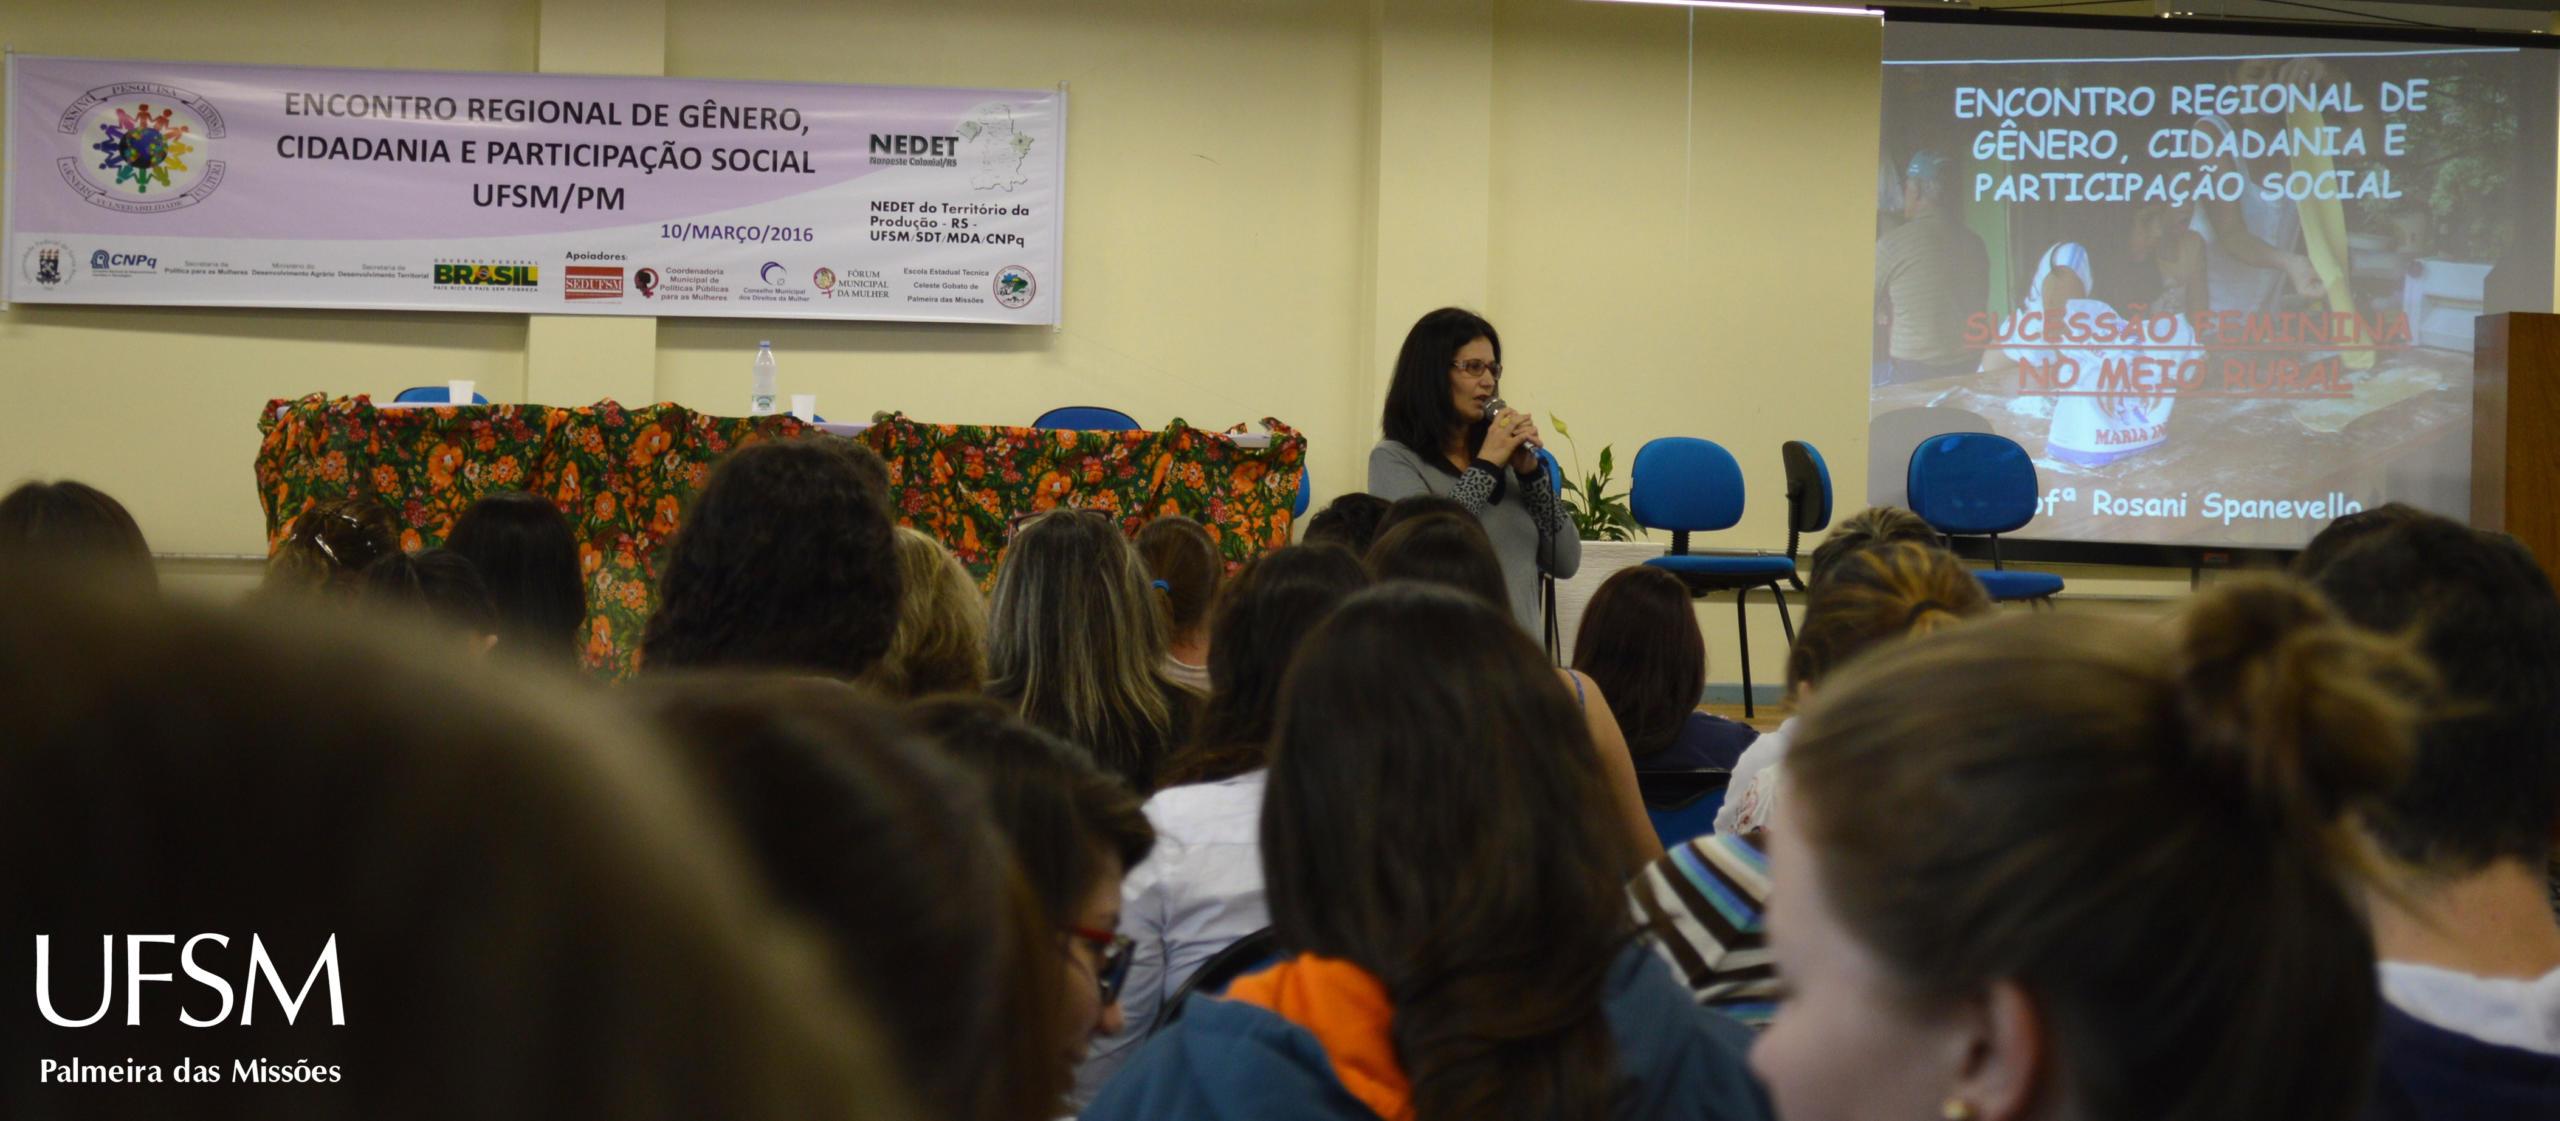 4 - Palestra prof.ª Rosani Spanevello